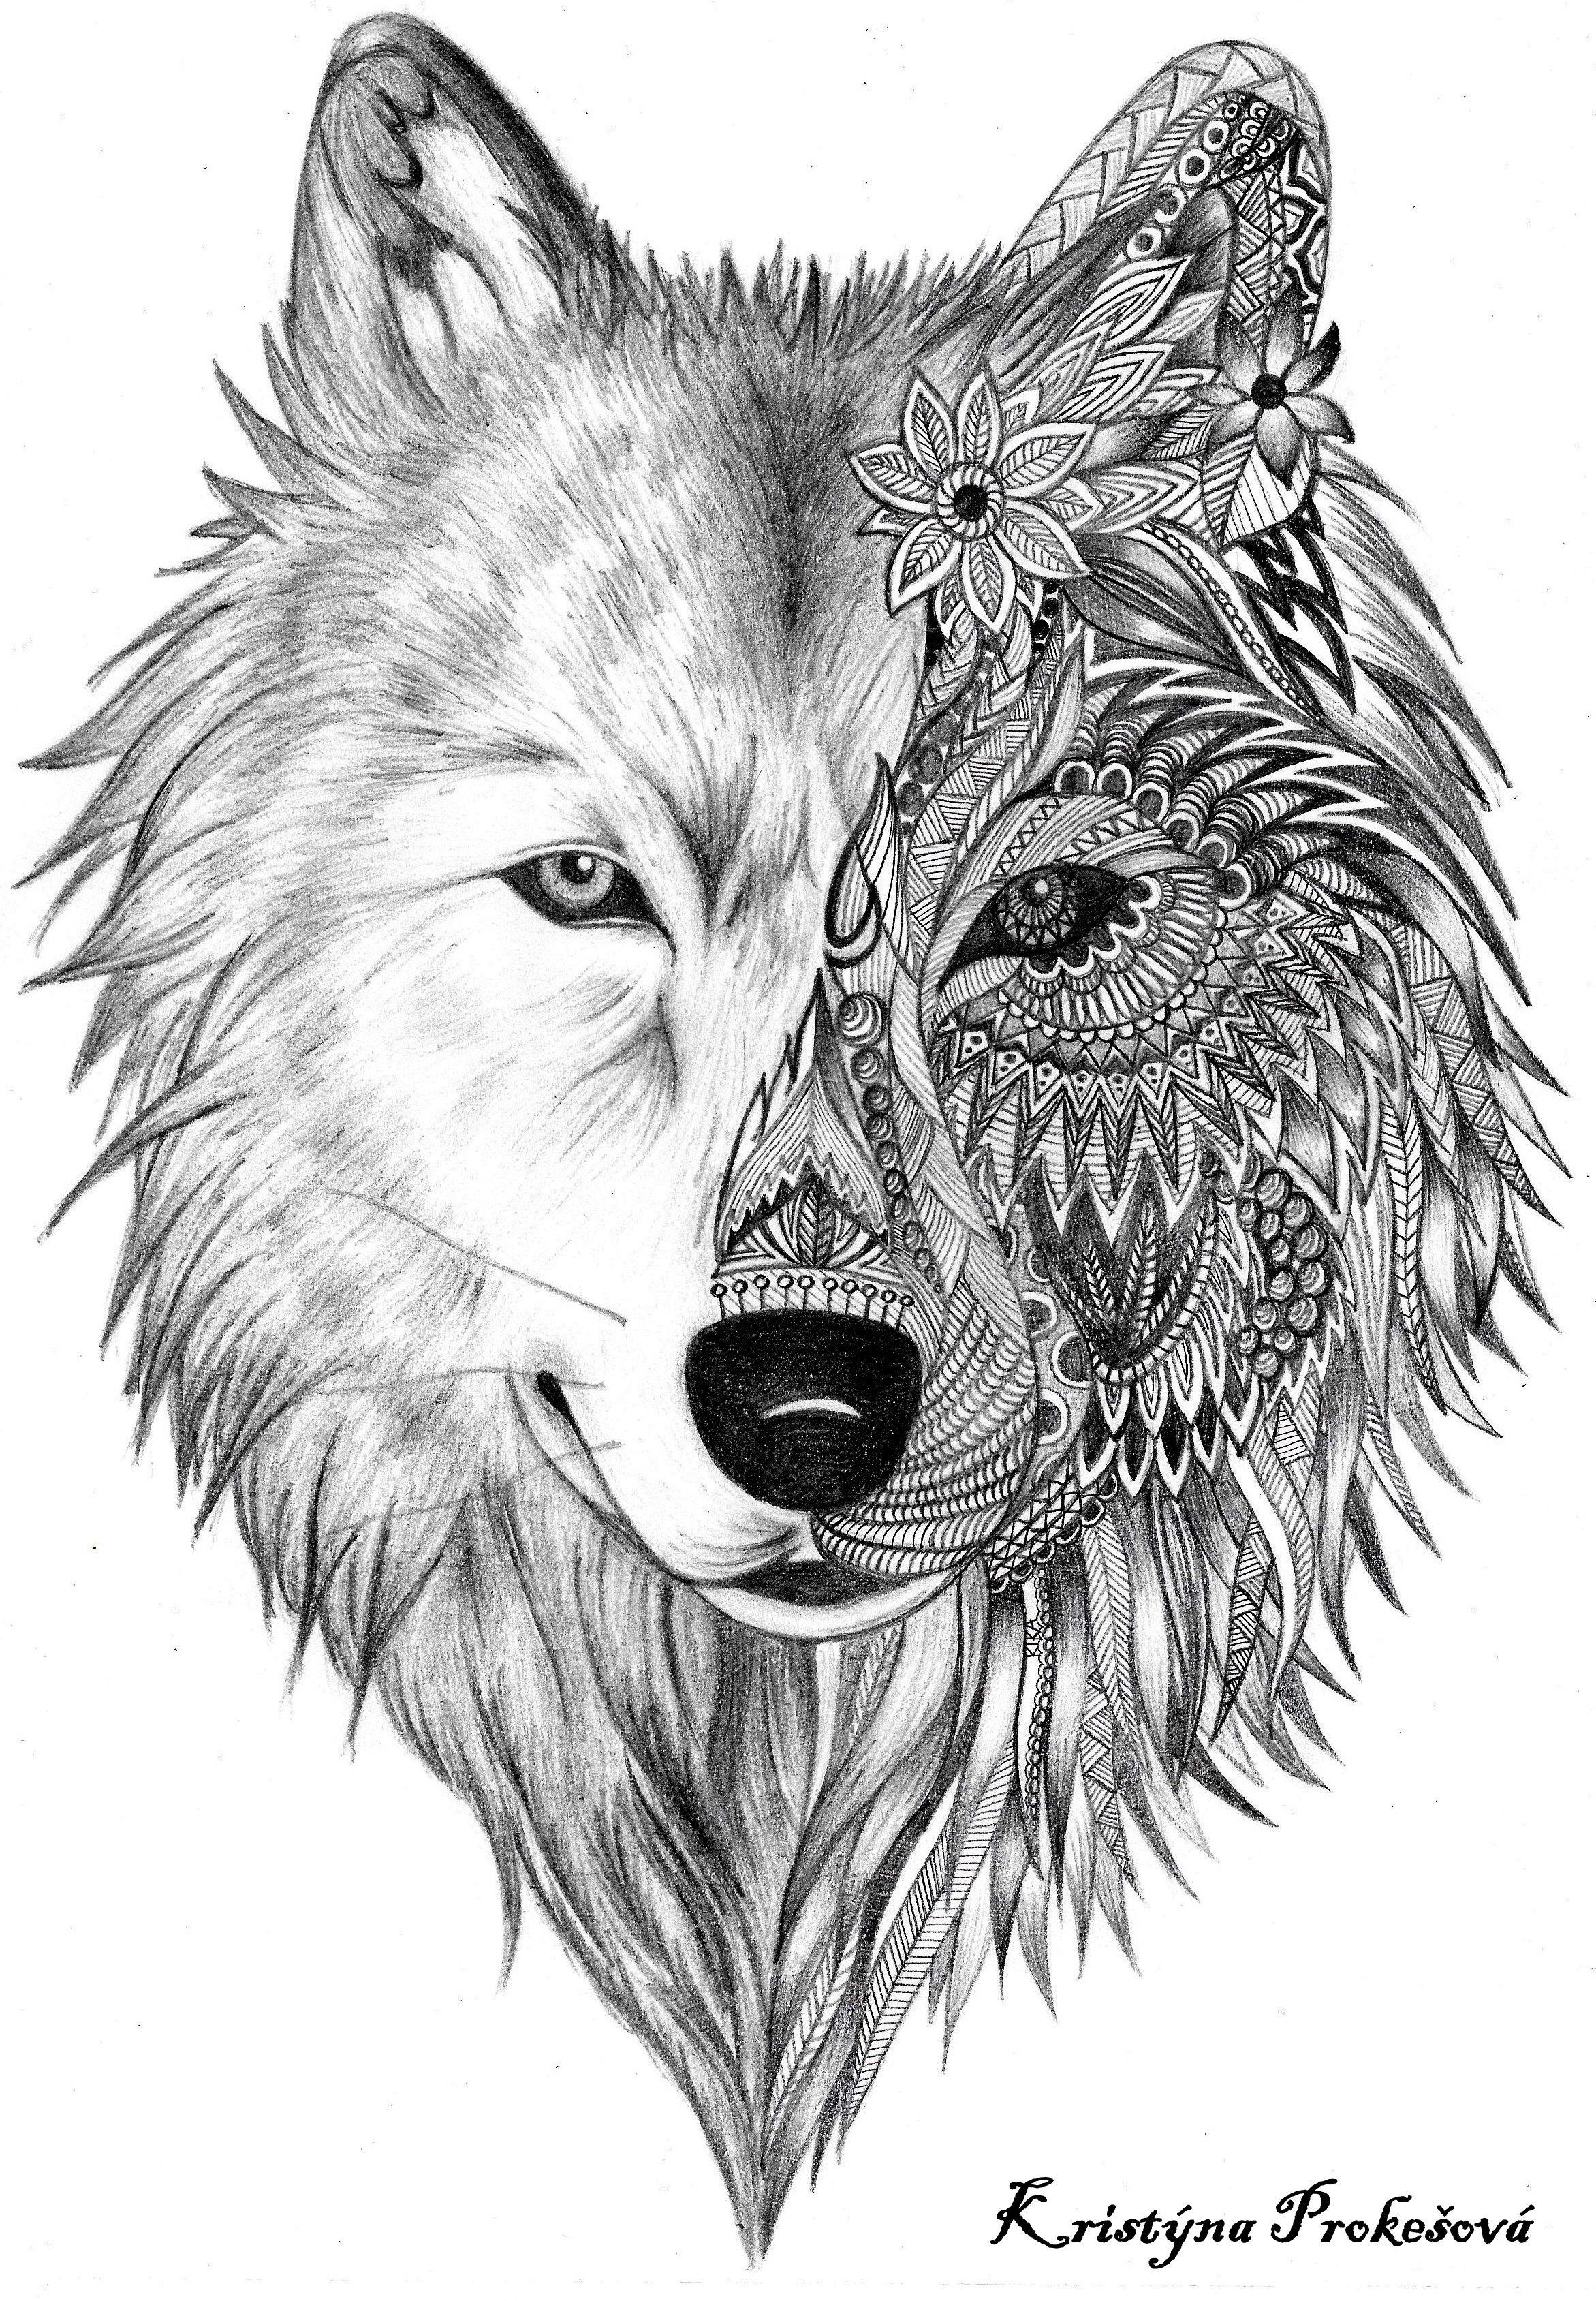 Coloriage De Loup Mandala.Coloriage Loup Mandala Coloriage Mandala Loup Vm95